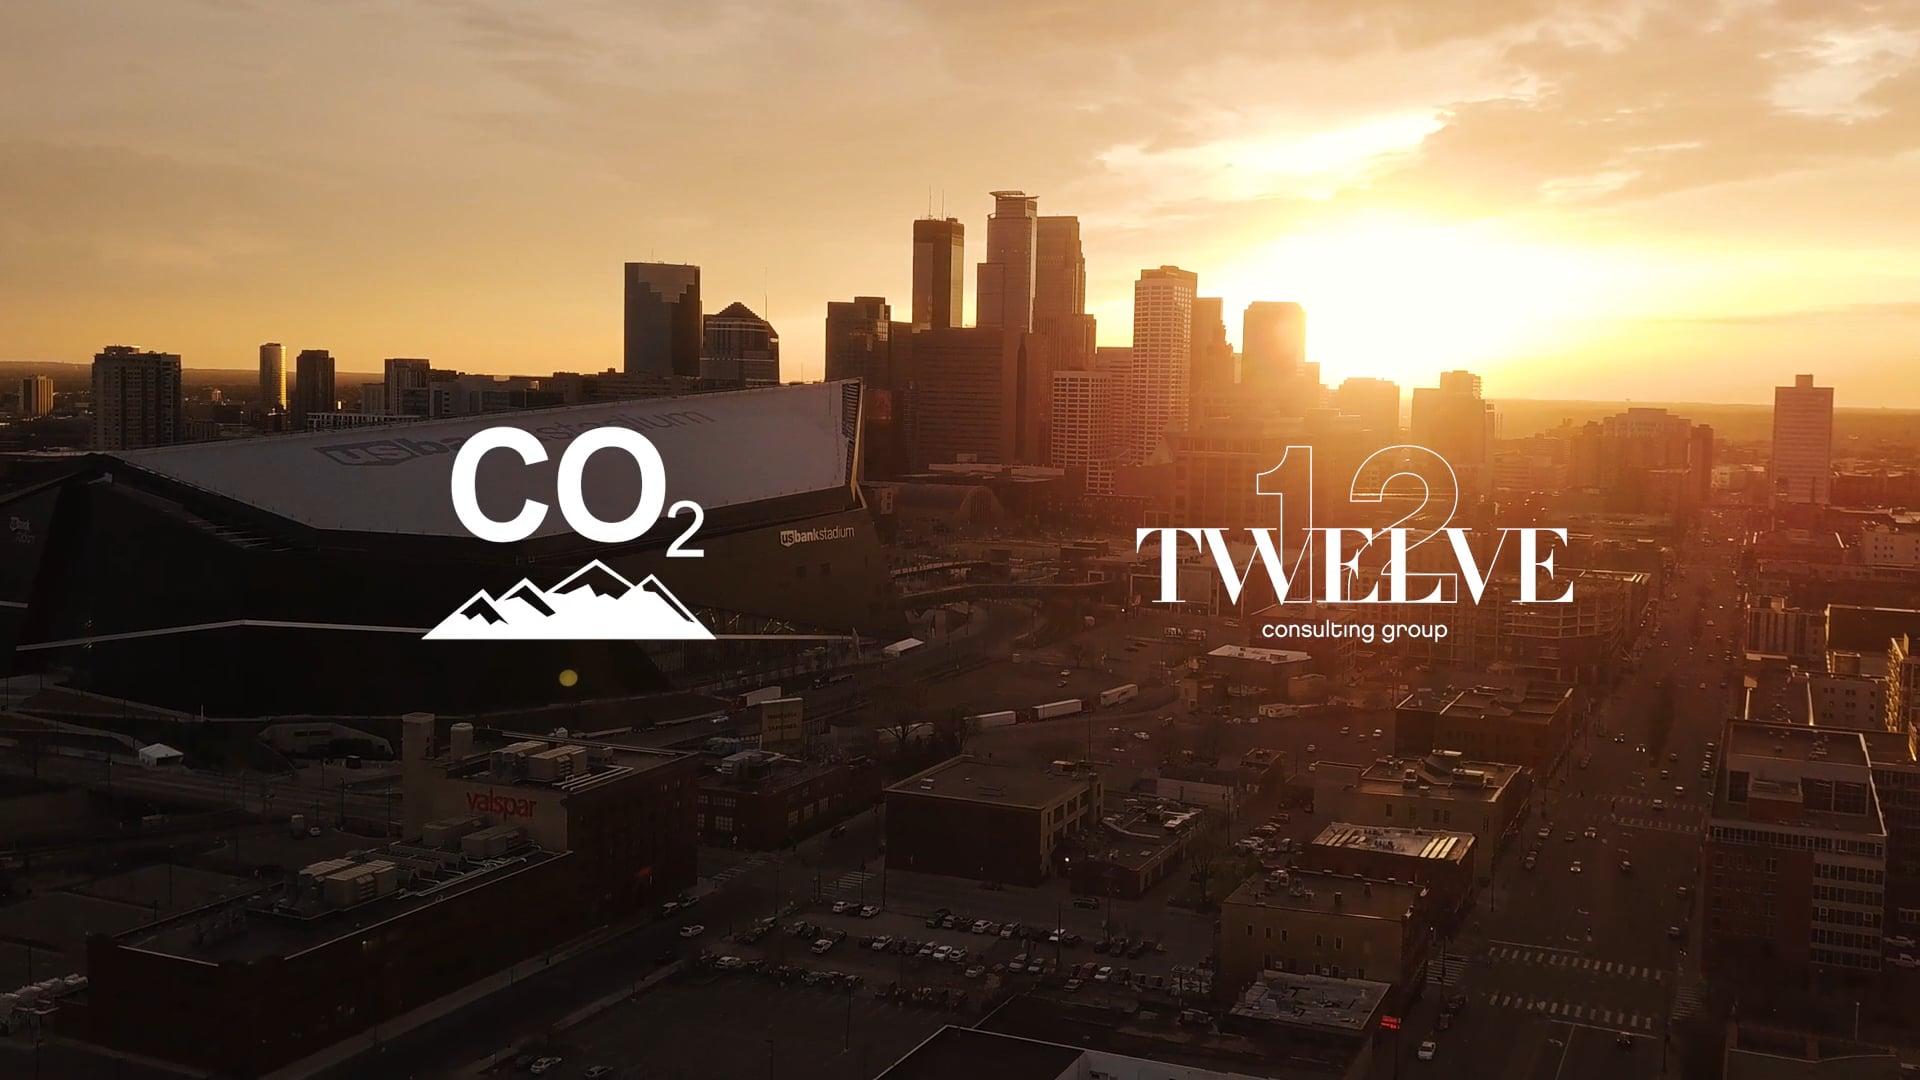 Twelve x CO2 Partnership